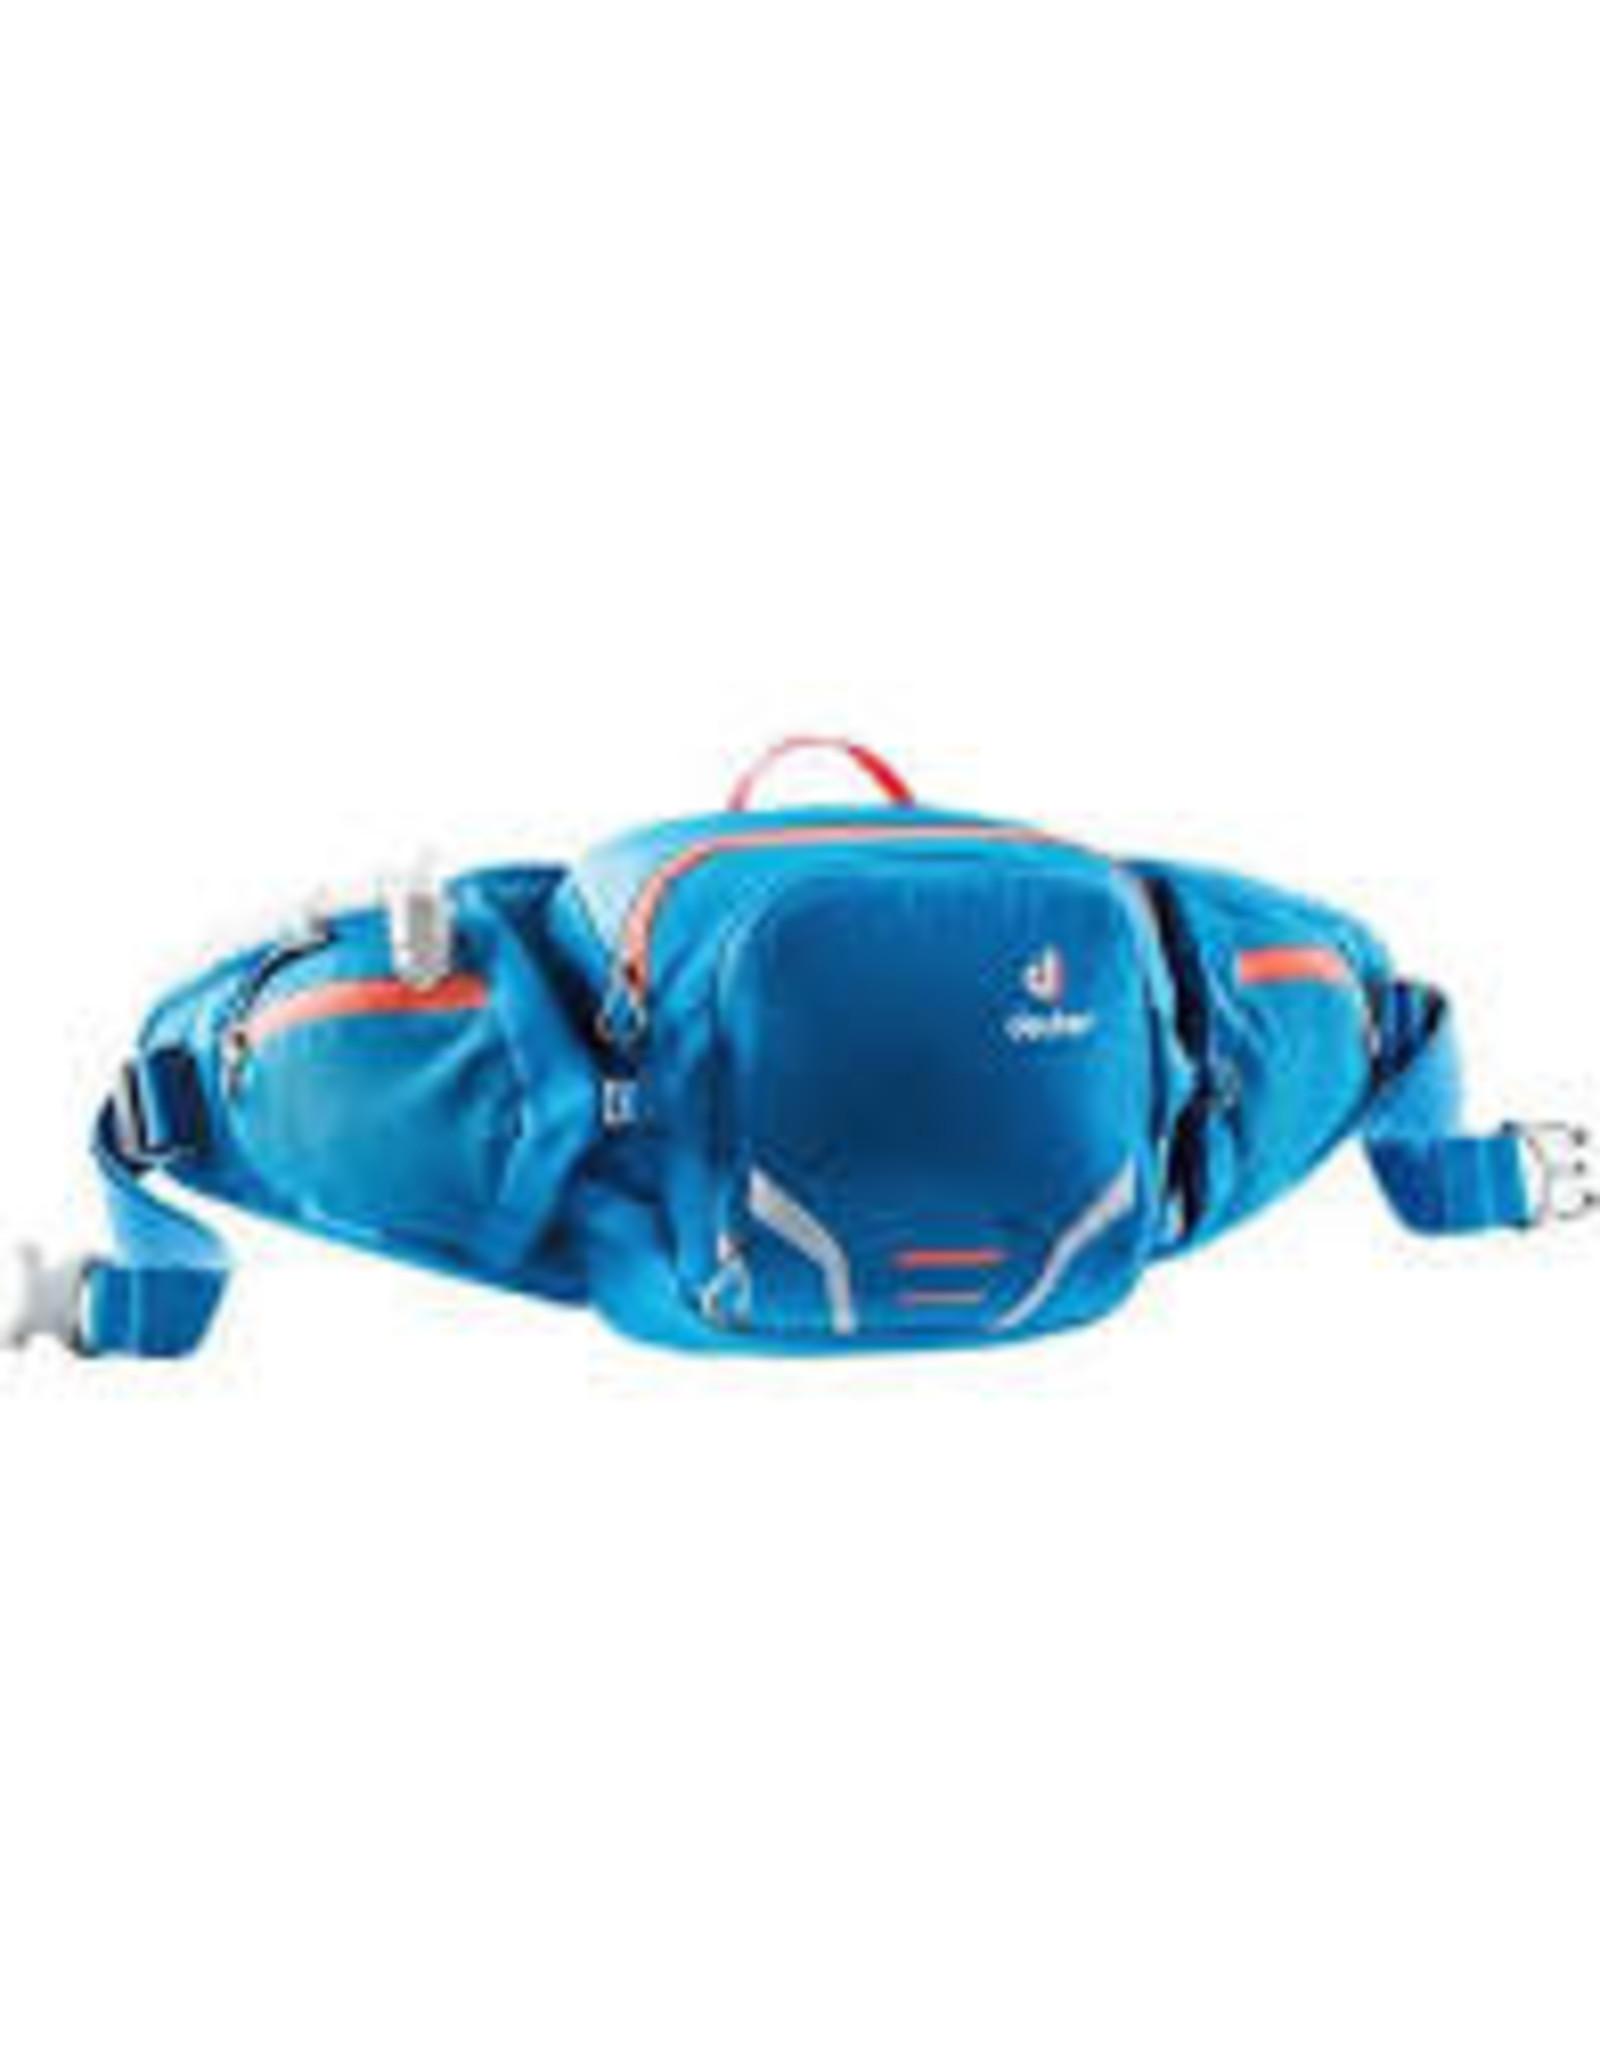 Deuter Packs Deuter Packs Pulse 3 Hip Bag, Bay